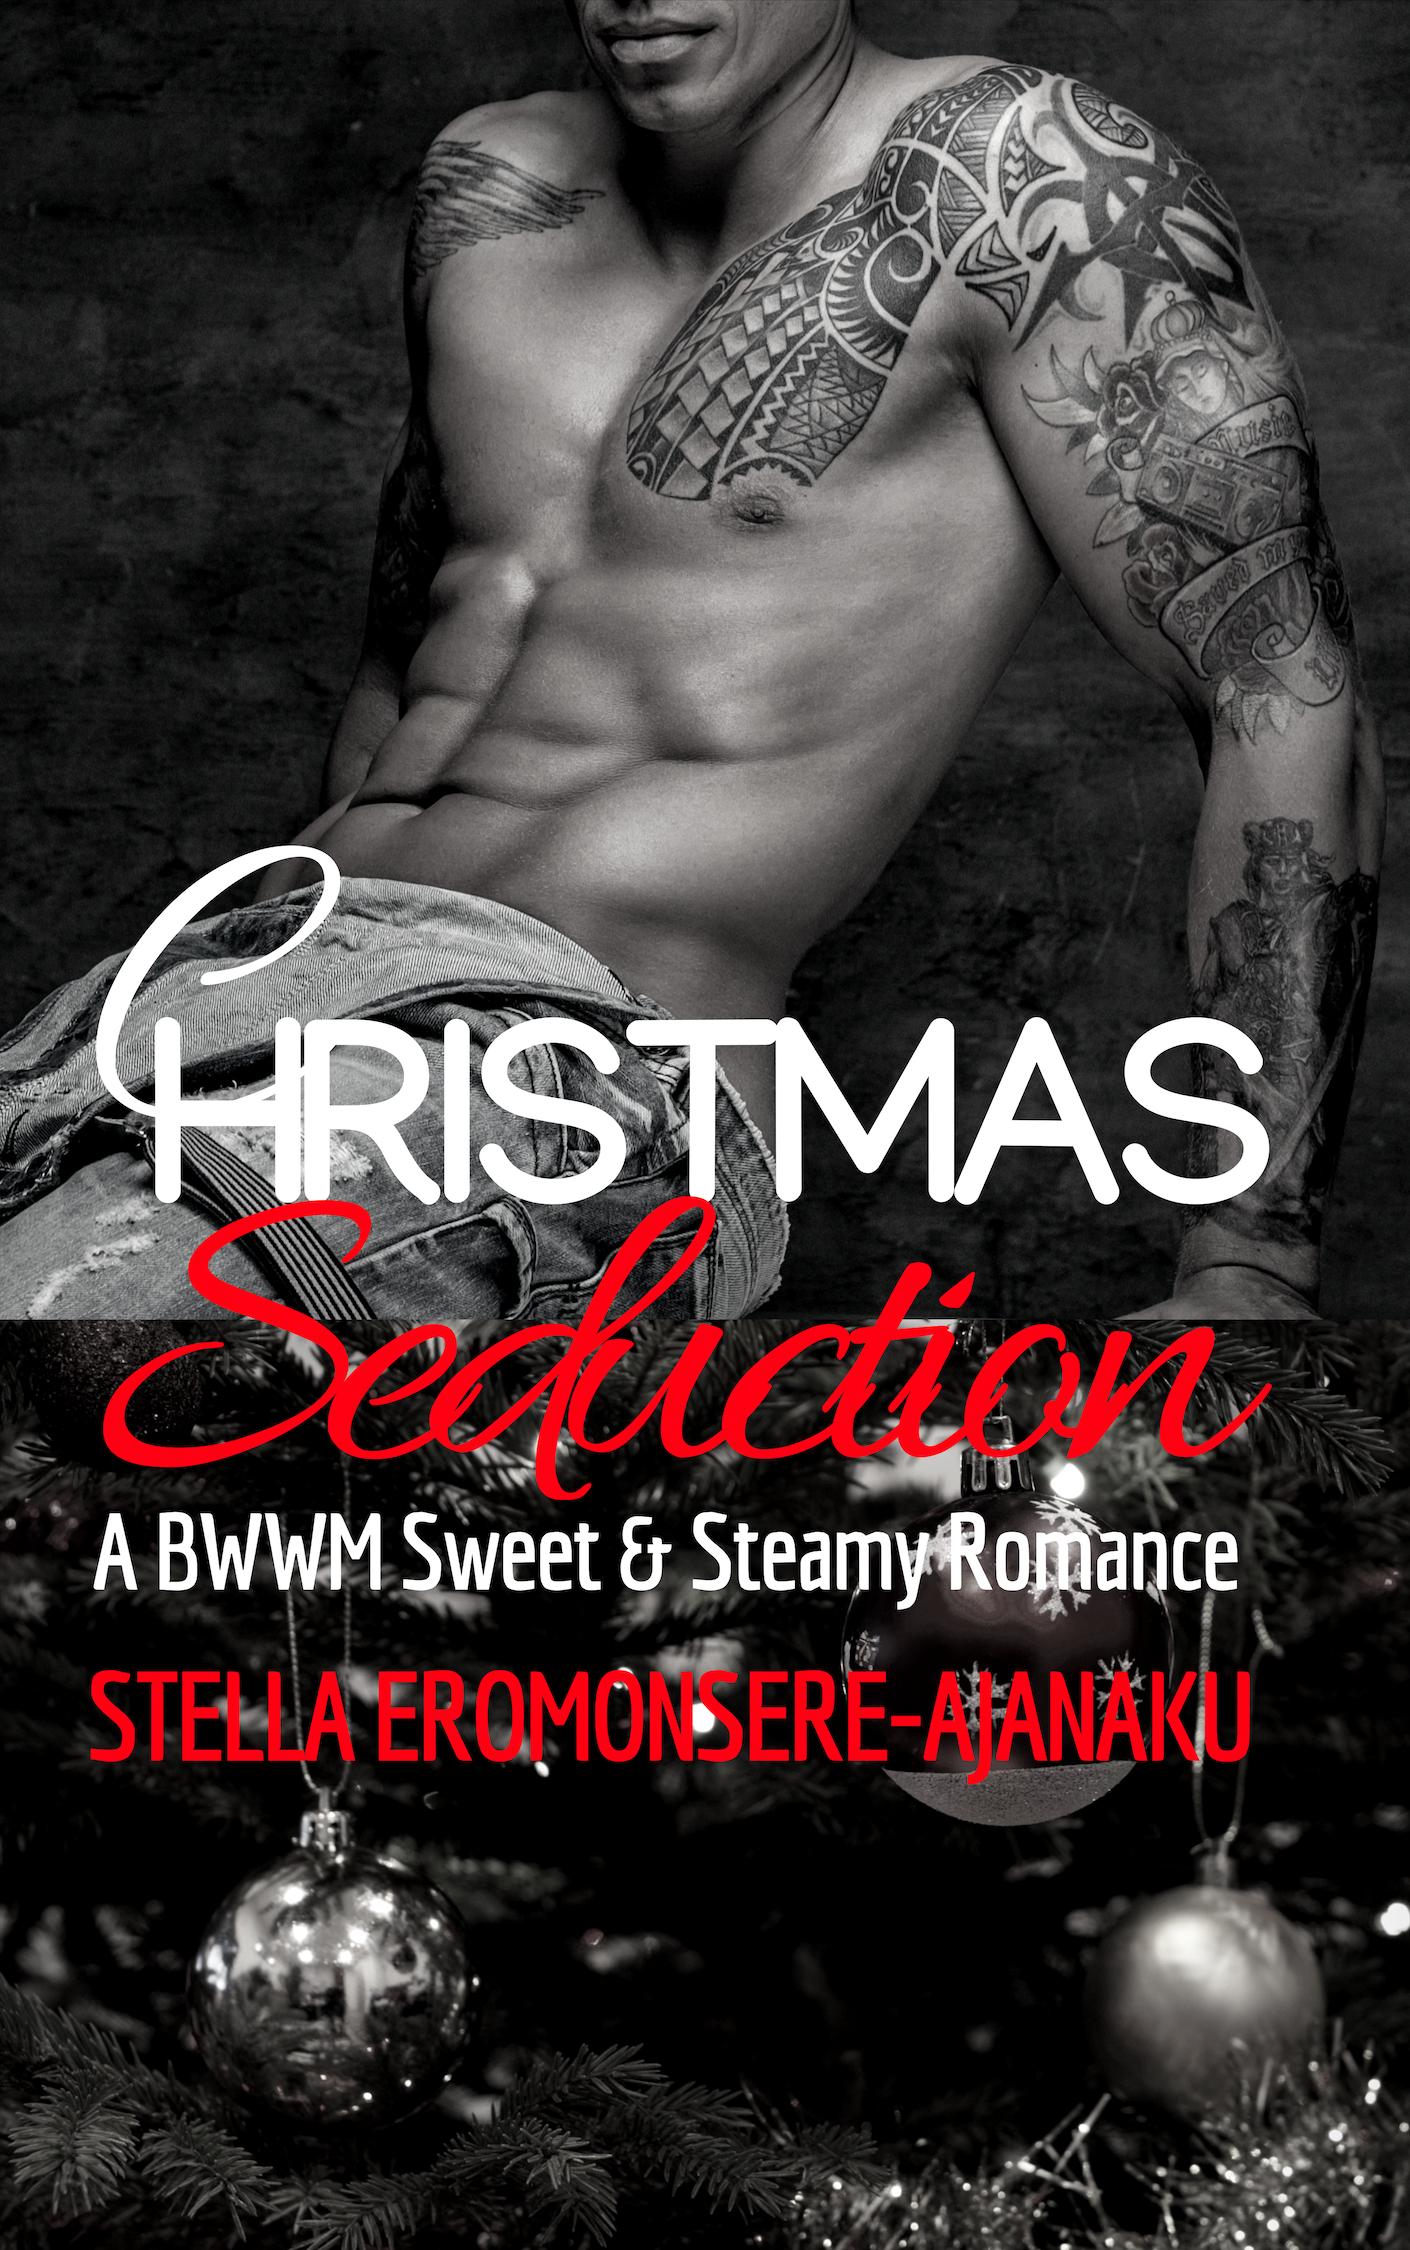 CHRISTMAS Seduction ~ A BWWM Sweet & Steamy Romance, an Ebook by Stella  Eromonsere-Ajanaku